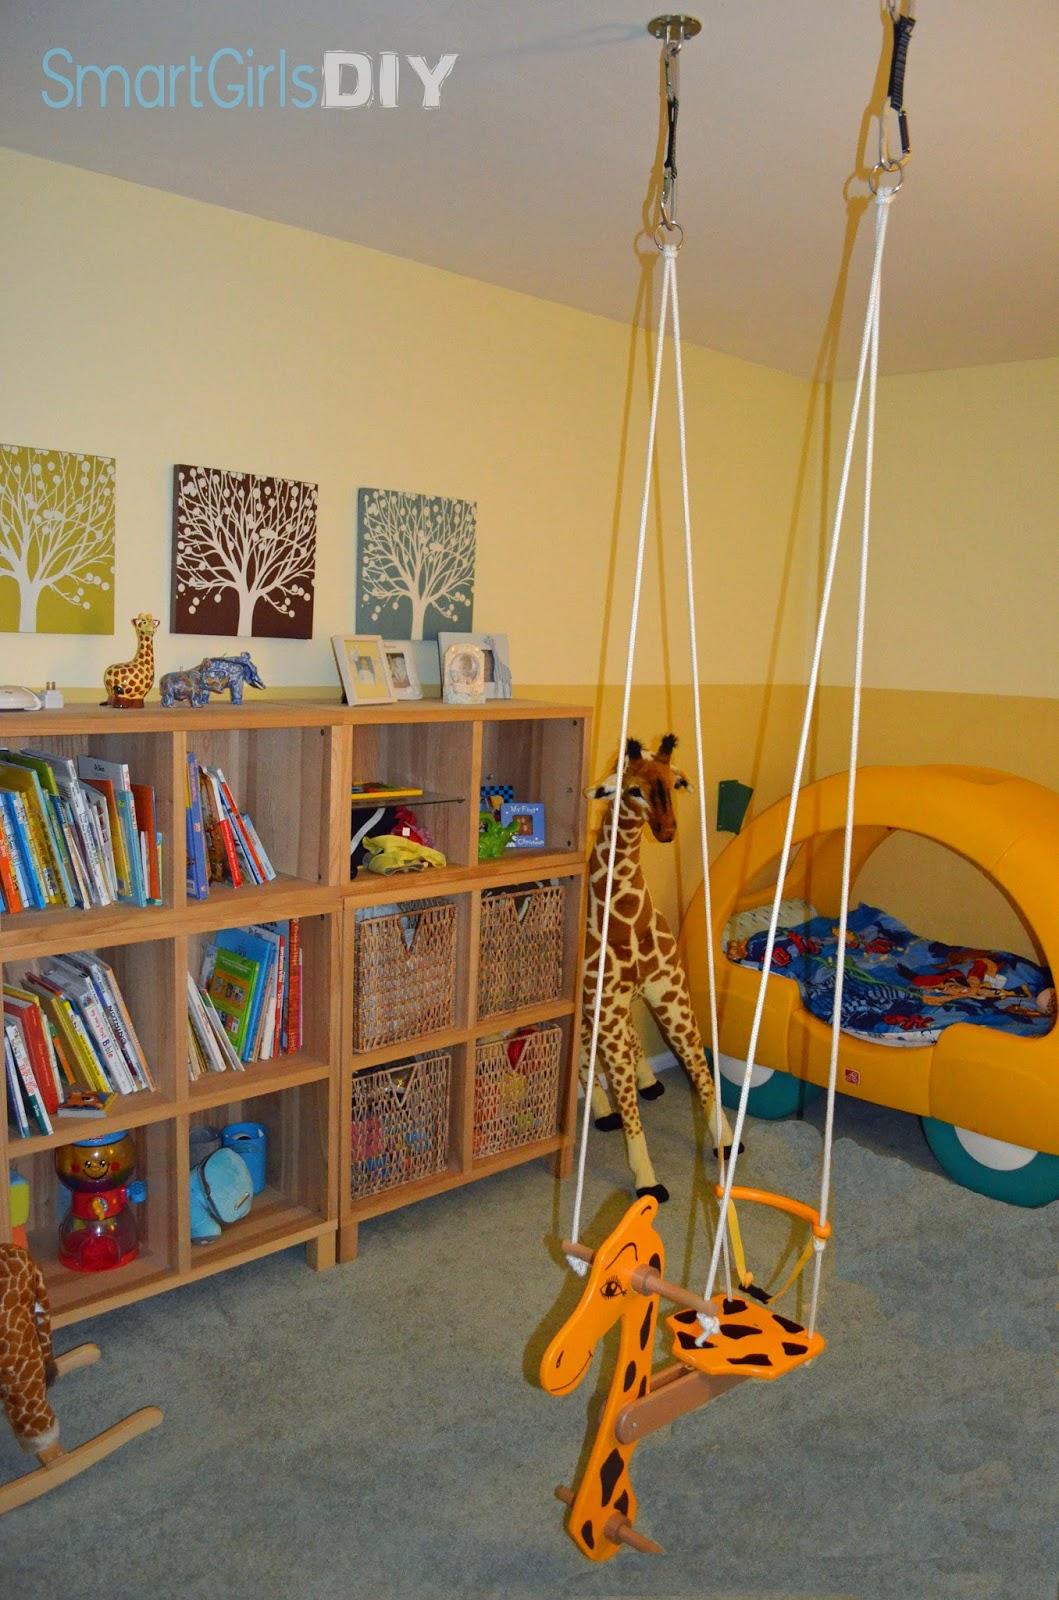 Car Bed And Giraffe Room